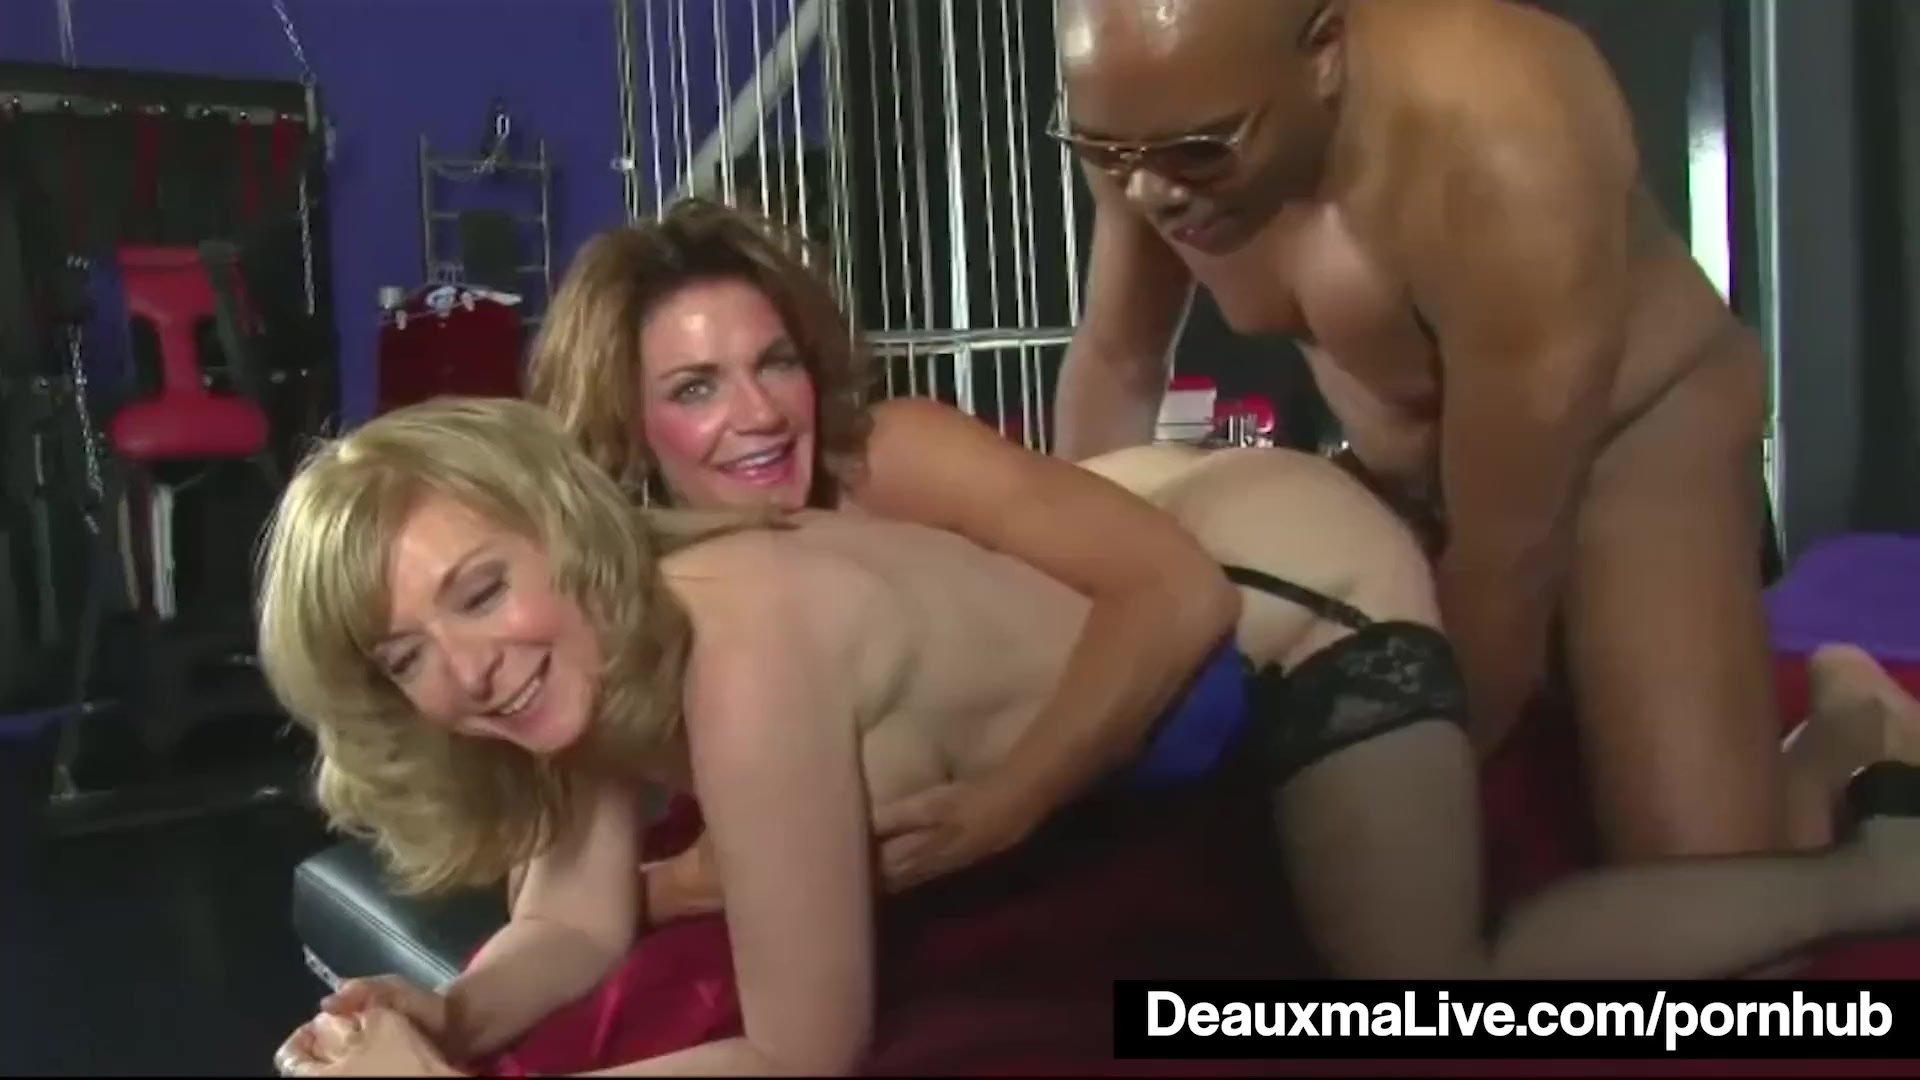 Mature MILFS Deauxma & Nina Hartley Share A Big Black Cock!